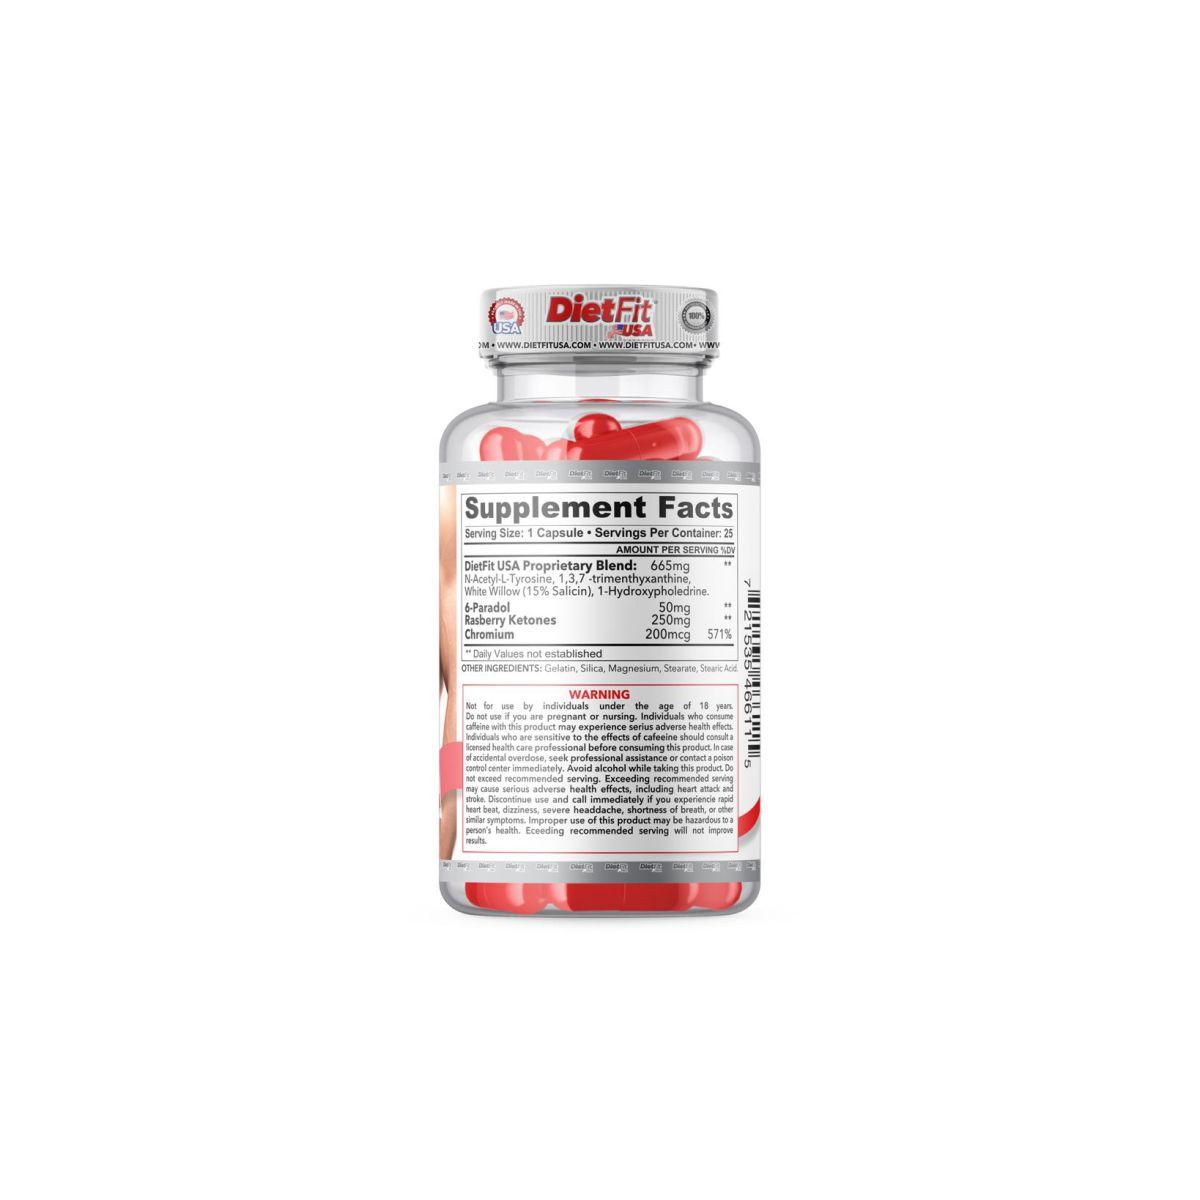 Termogênico DietFit DietCut 3 em 1 - 25 Caps